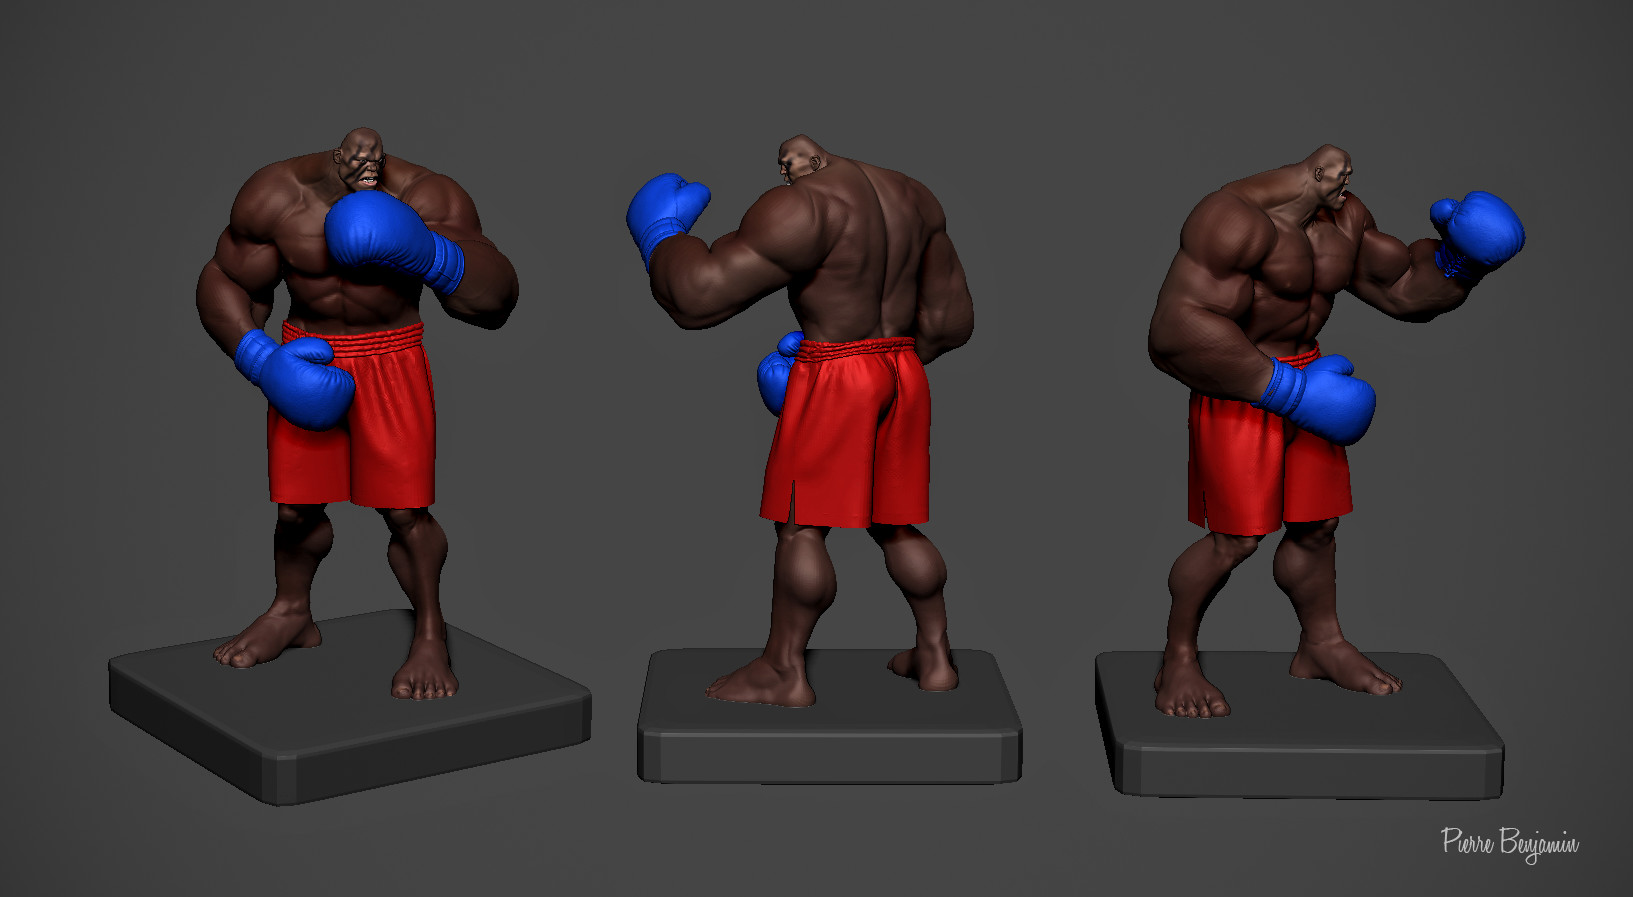 Pierre benjamin boxer newererer